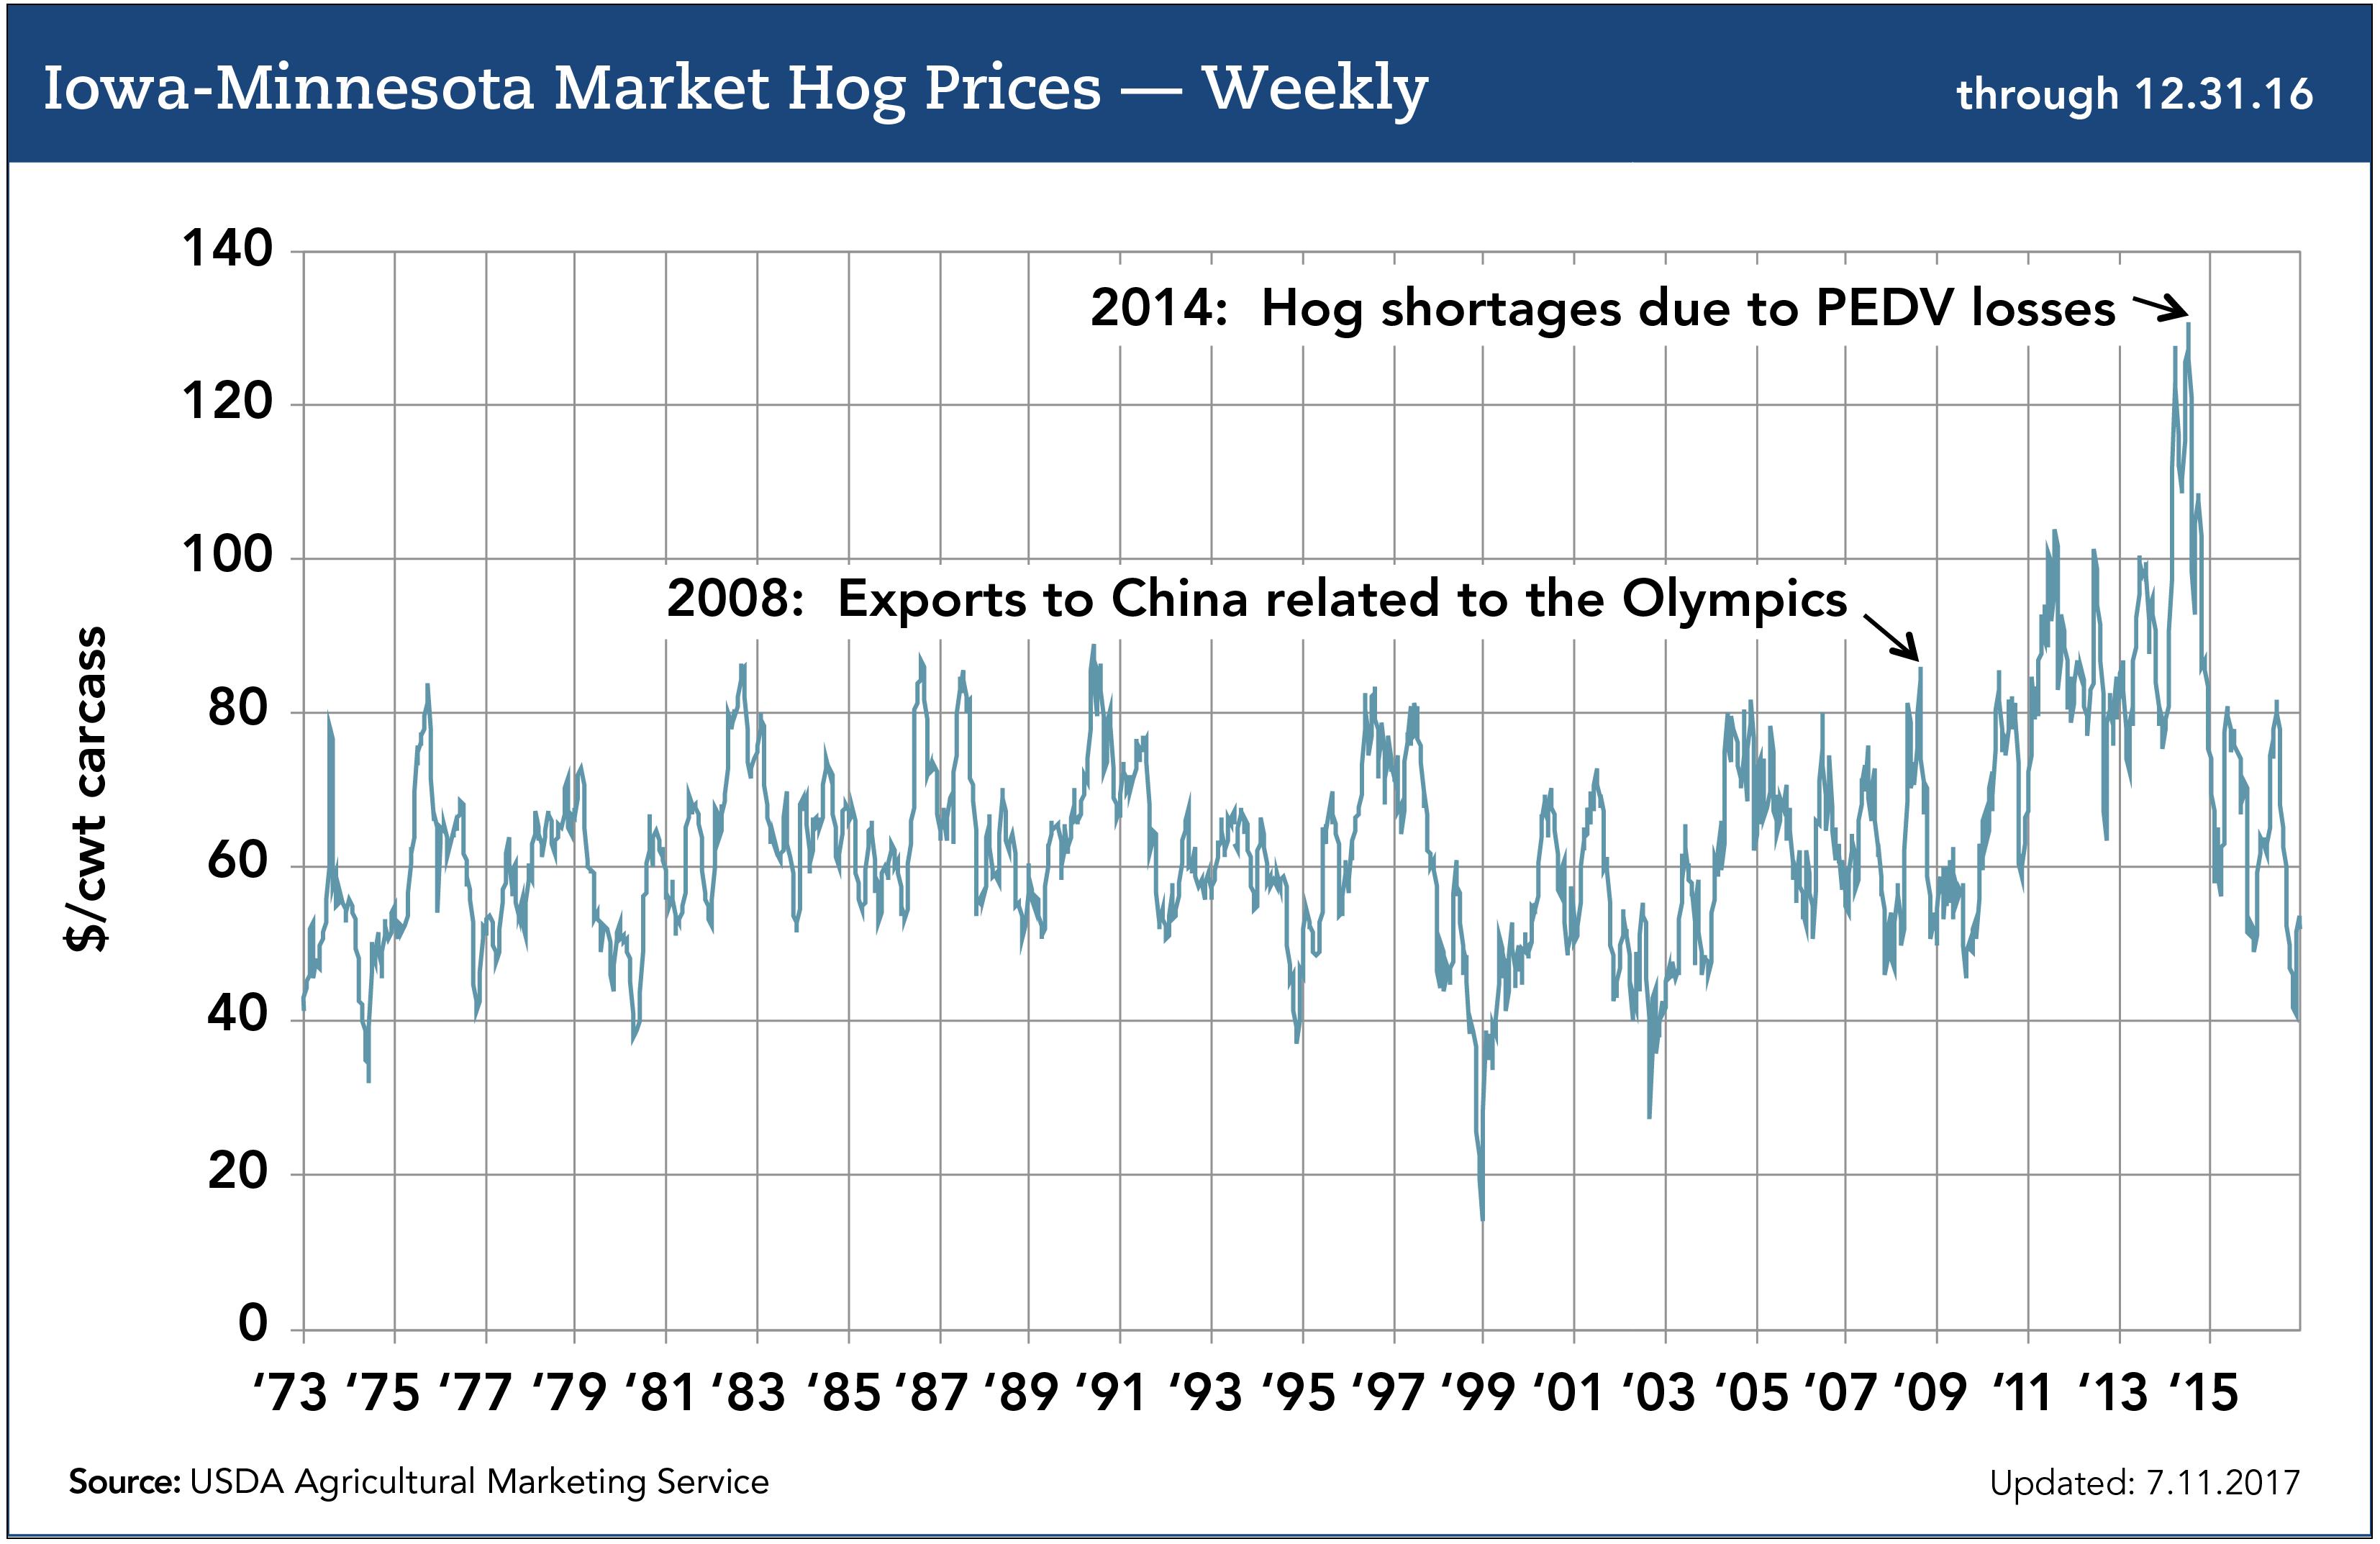 iowa minnesota market hog prices weekly 7.17